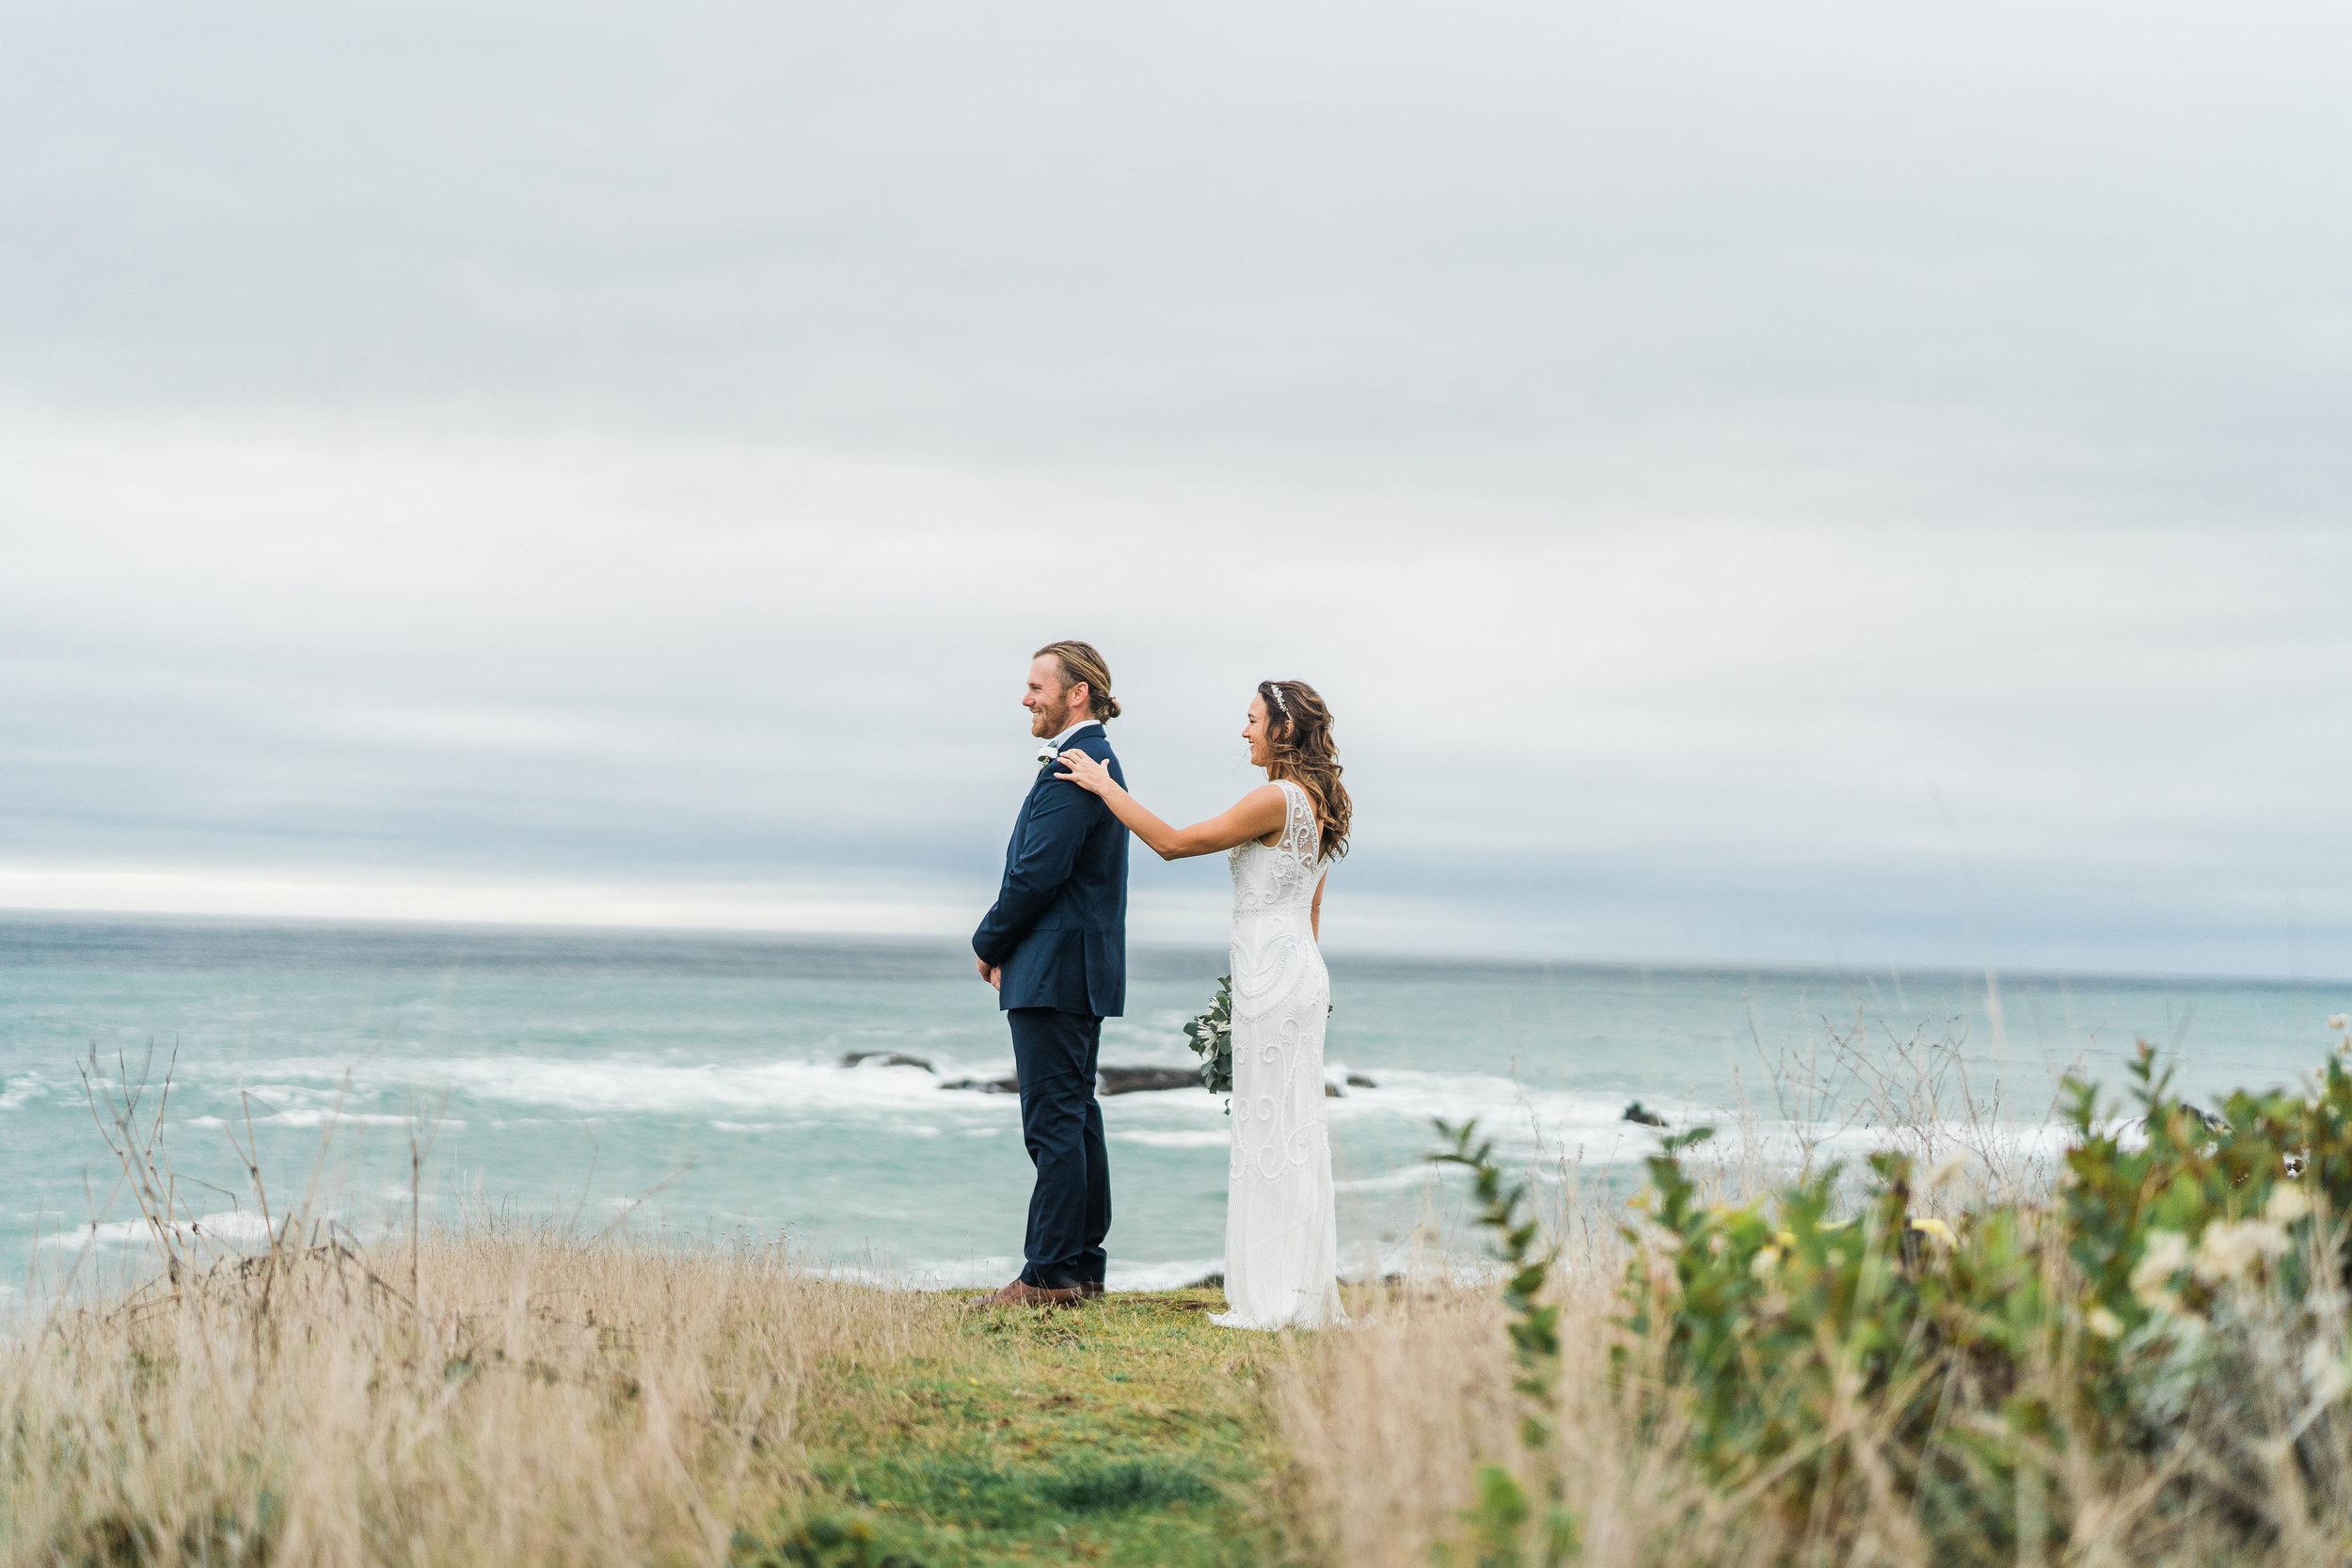 switzer-farm-wedding-westport-brandon-bibbins-photograhy-fine-art-040.jpg